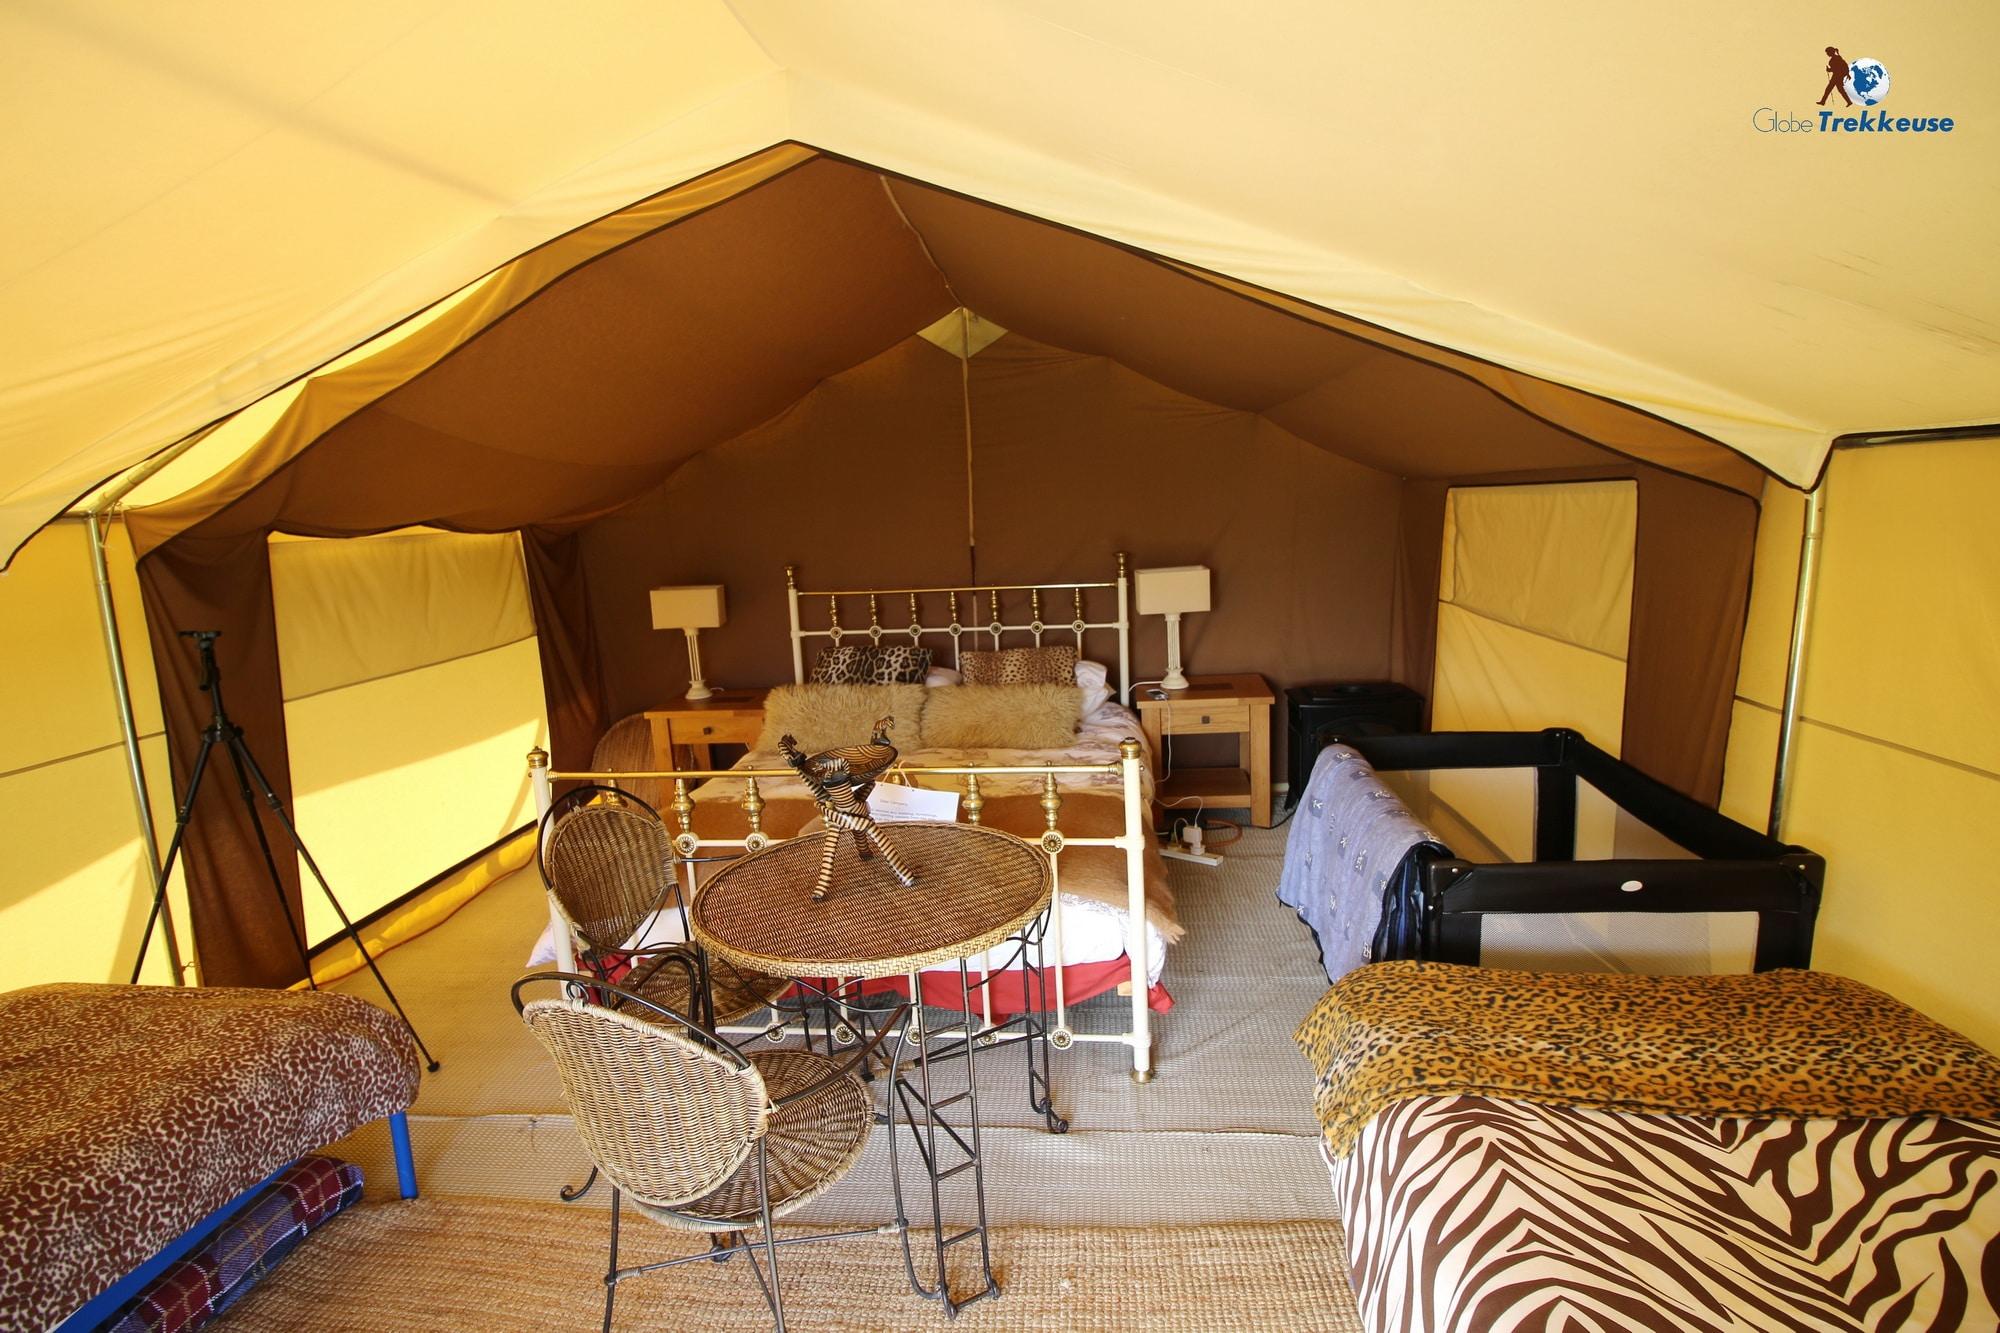 jersey safari tent inside